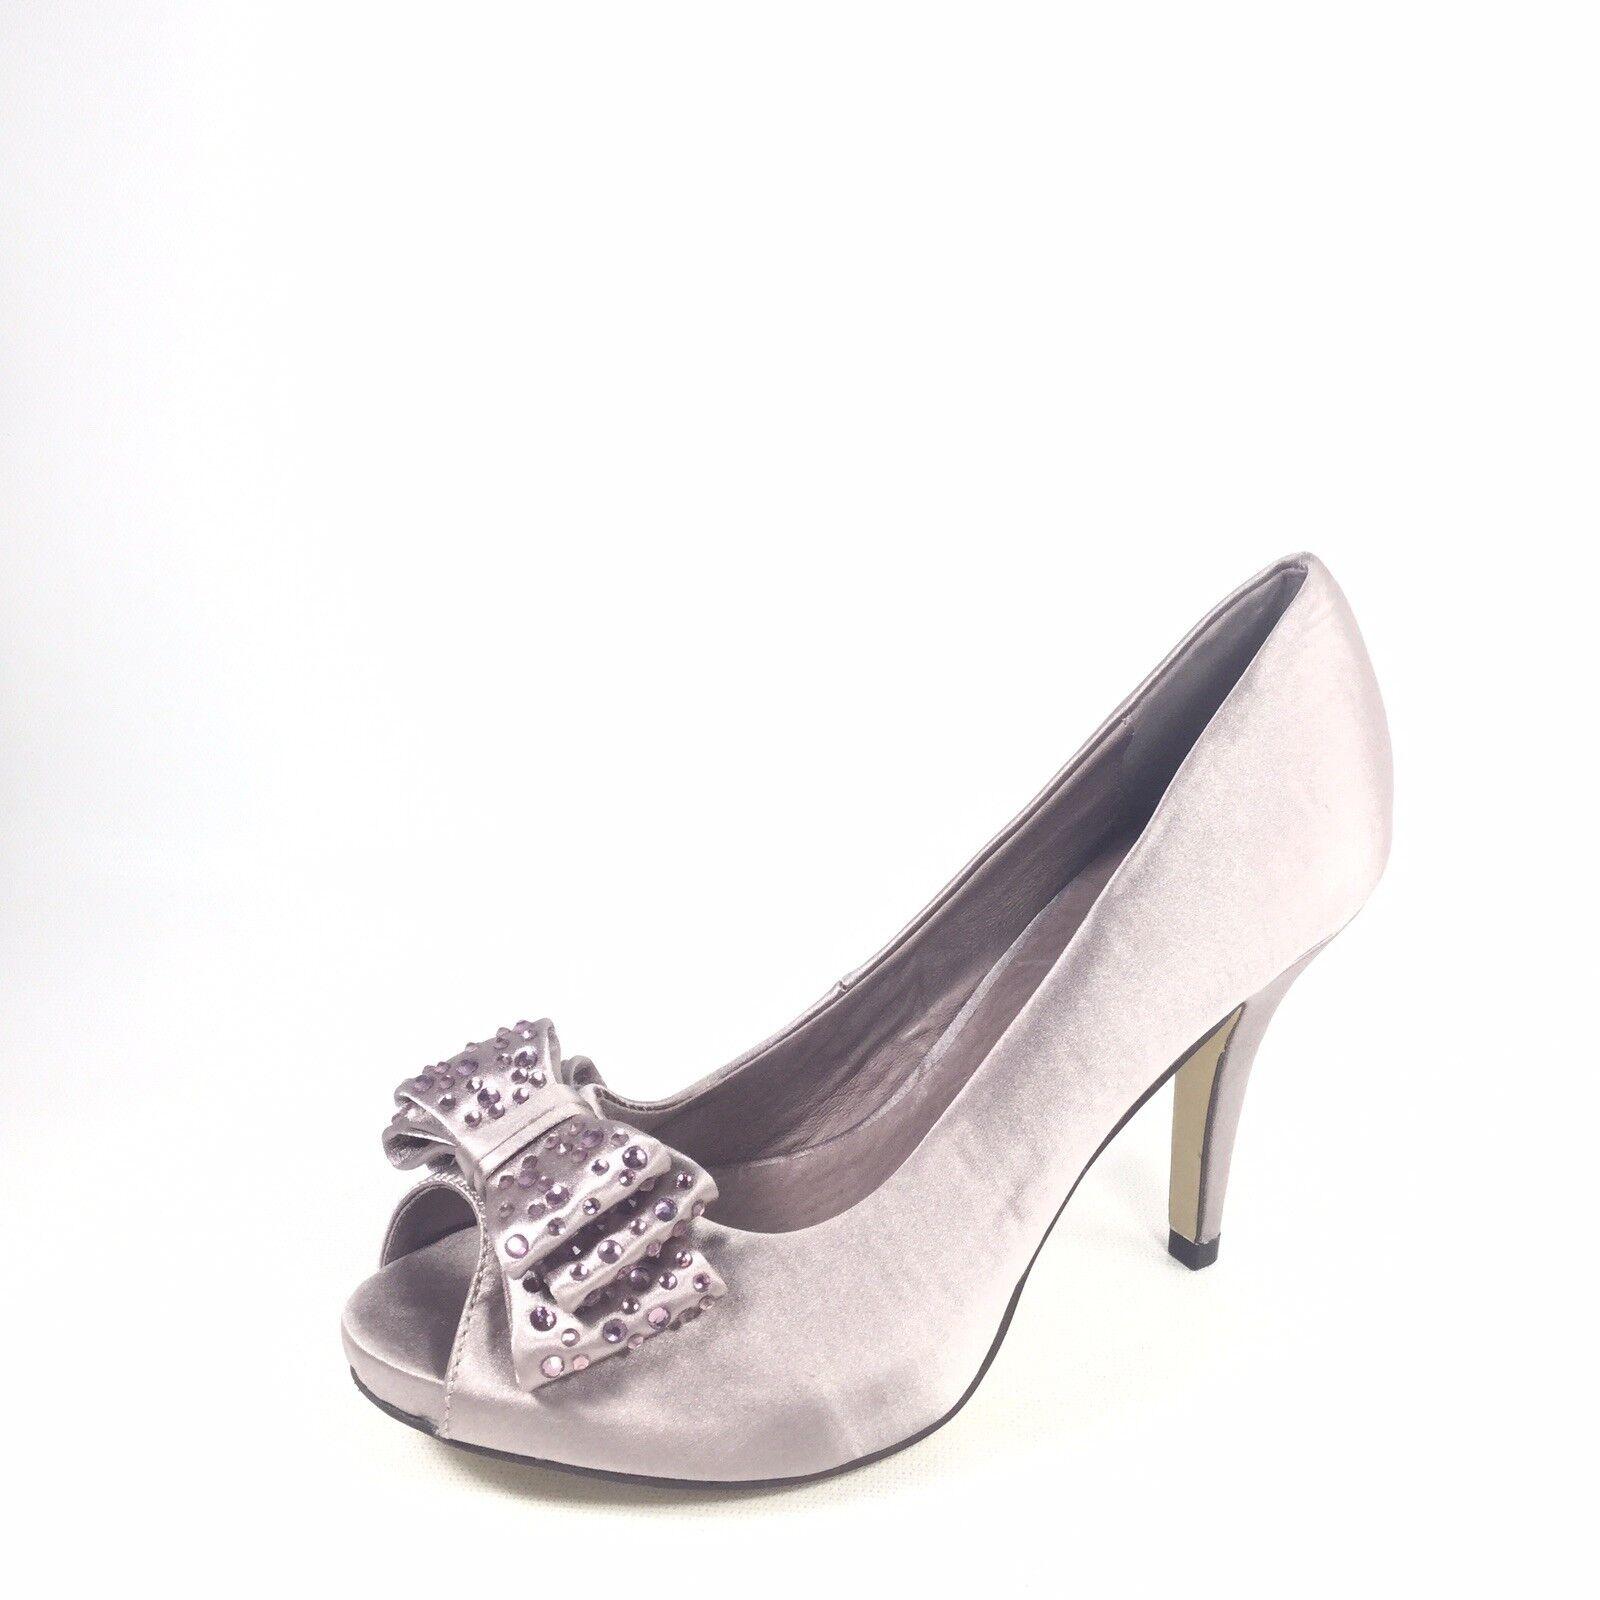 Menbur Womens Size Euro 35 M Heel Open Toe Dress shoes.